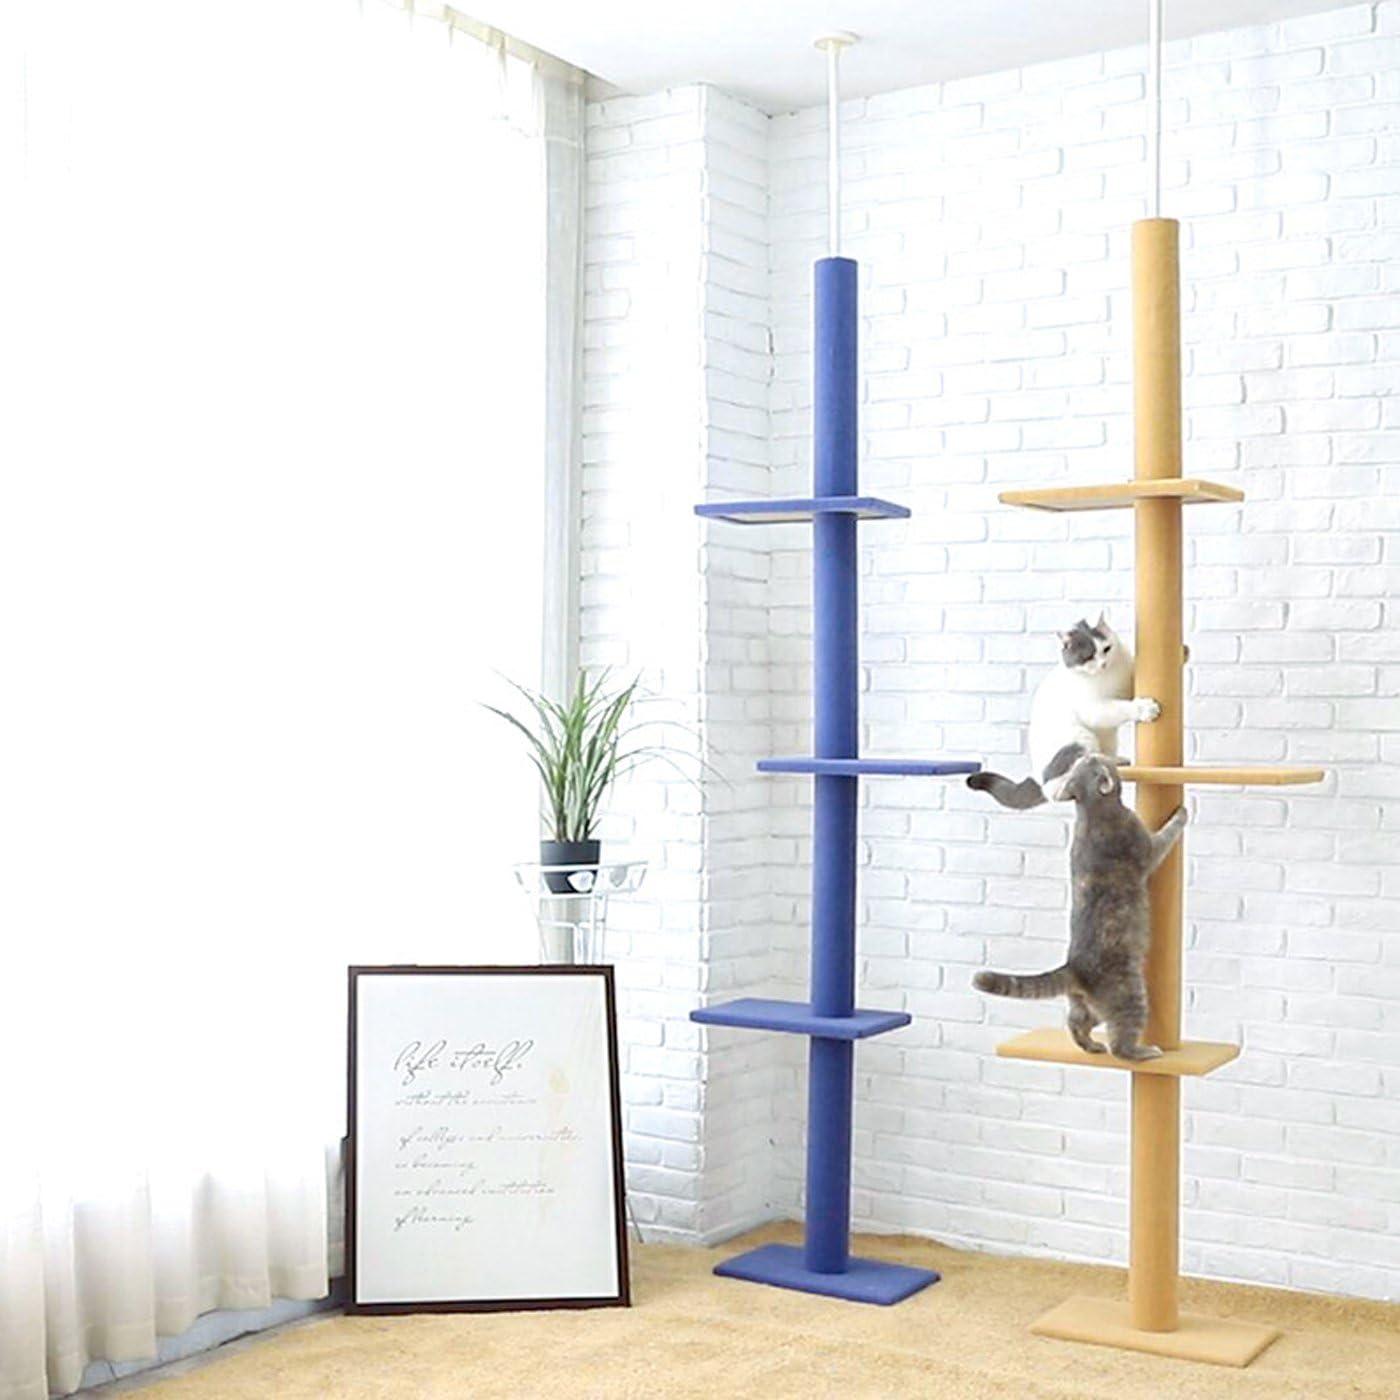 S-Lifeeling Cat Climbing Toys Tower Structures Cat Climber Tree Post Shelves Multilayer Platform Super Long Large Cat Climbing Tree Cat Tree Furniture Scratch (Purple) : Pet Supplies